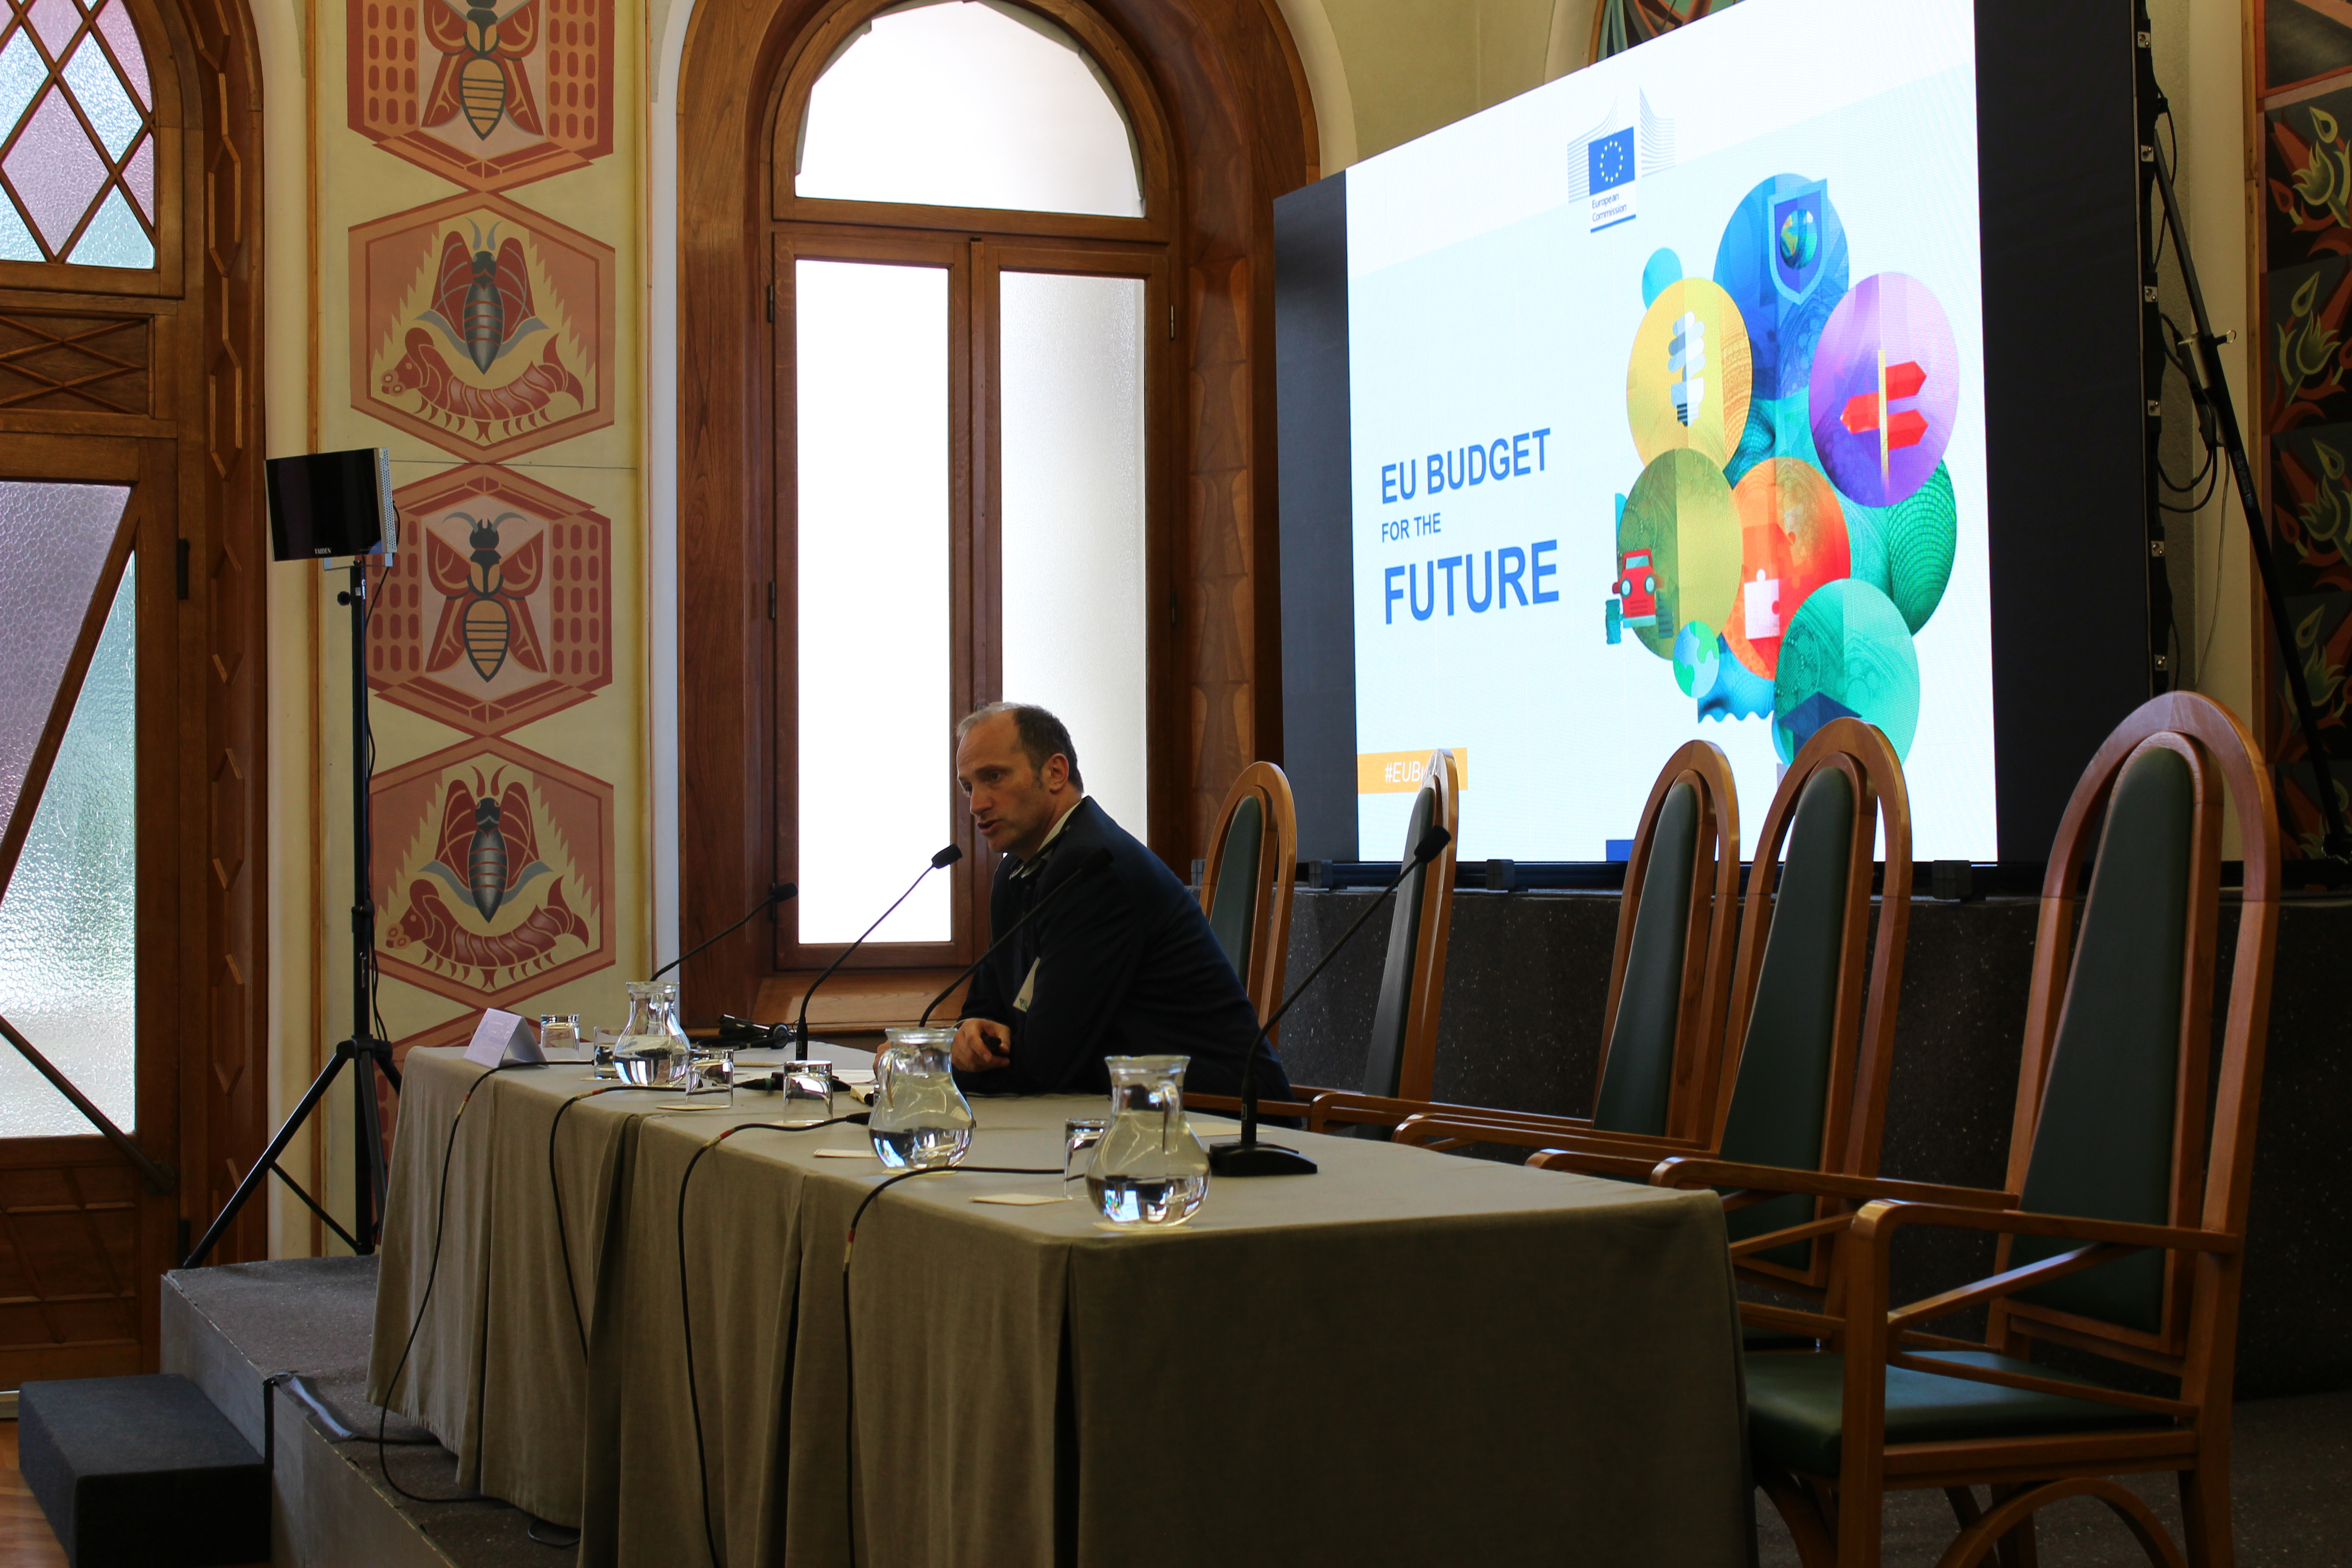 EU Budget and the Future - Antongiulio Marin DG Move